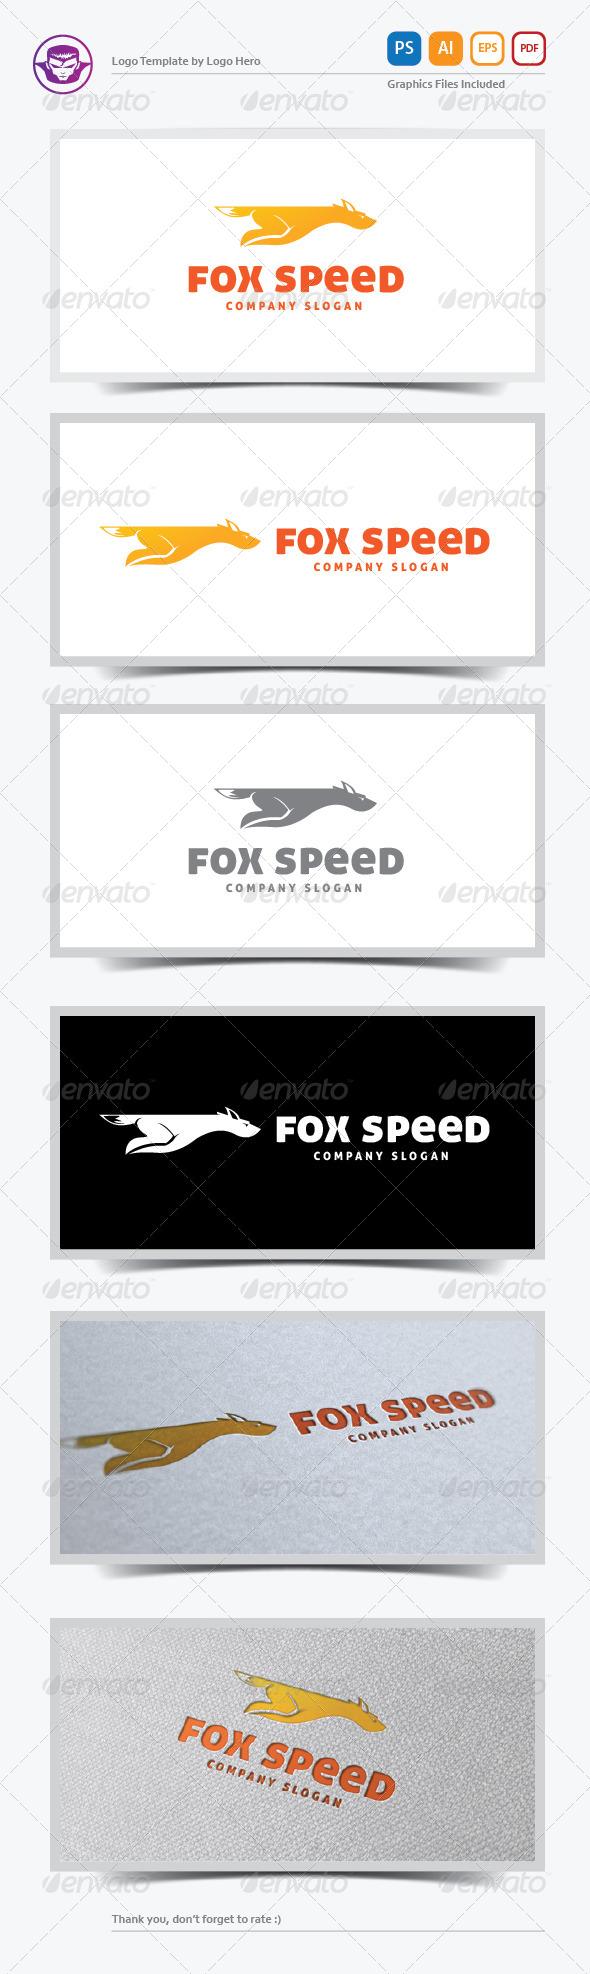 Fox Speed Logo Template